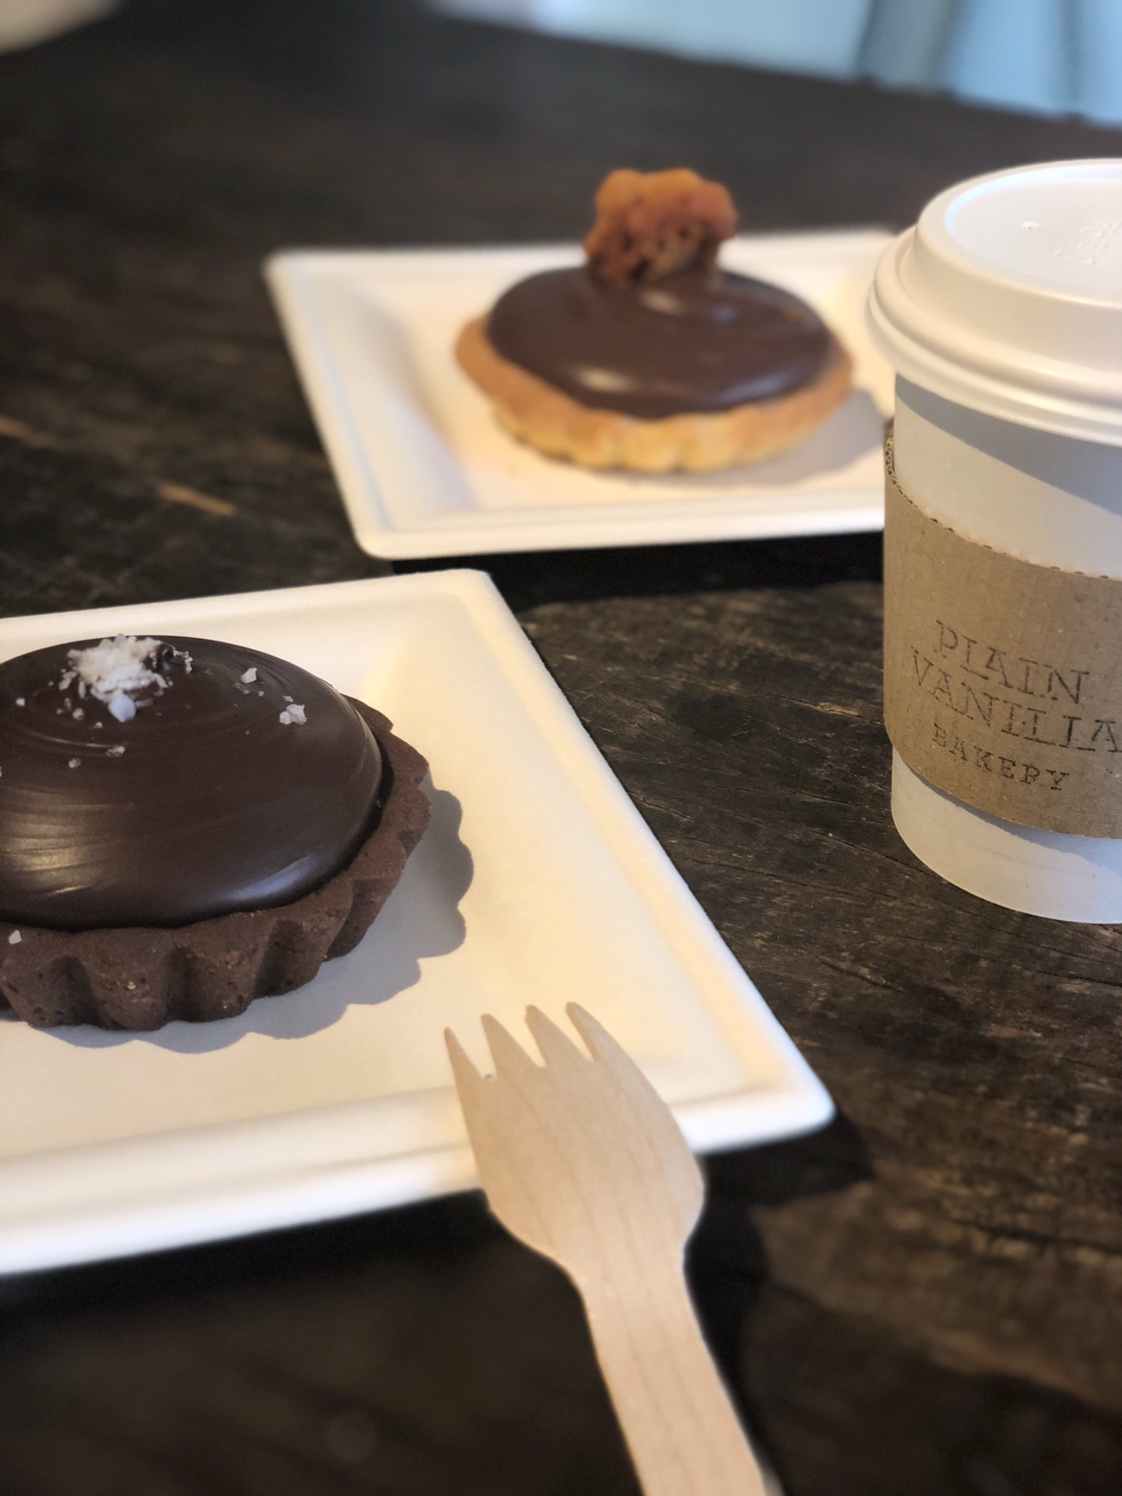 plain_vanilla_dessert.jpg